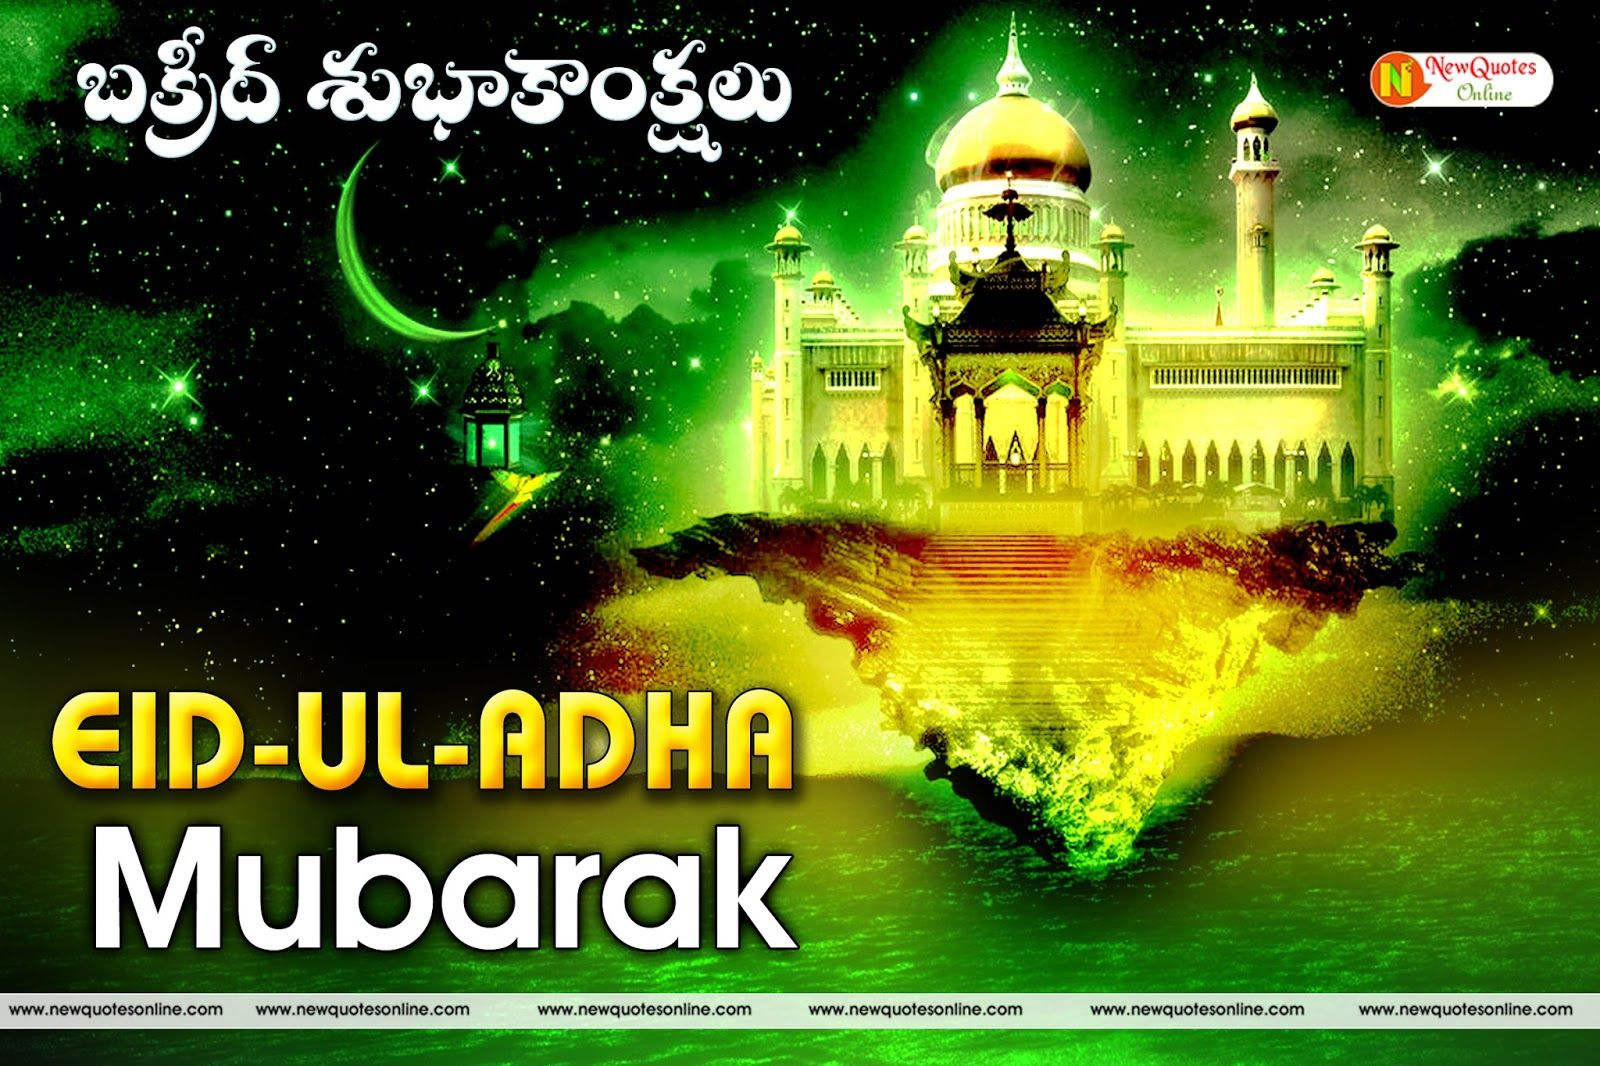 Cute Happy Eid Ul Adha Mubarak Islamic Wish Photos Images